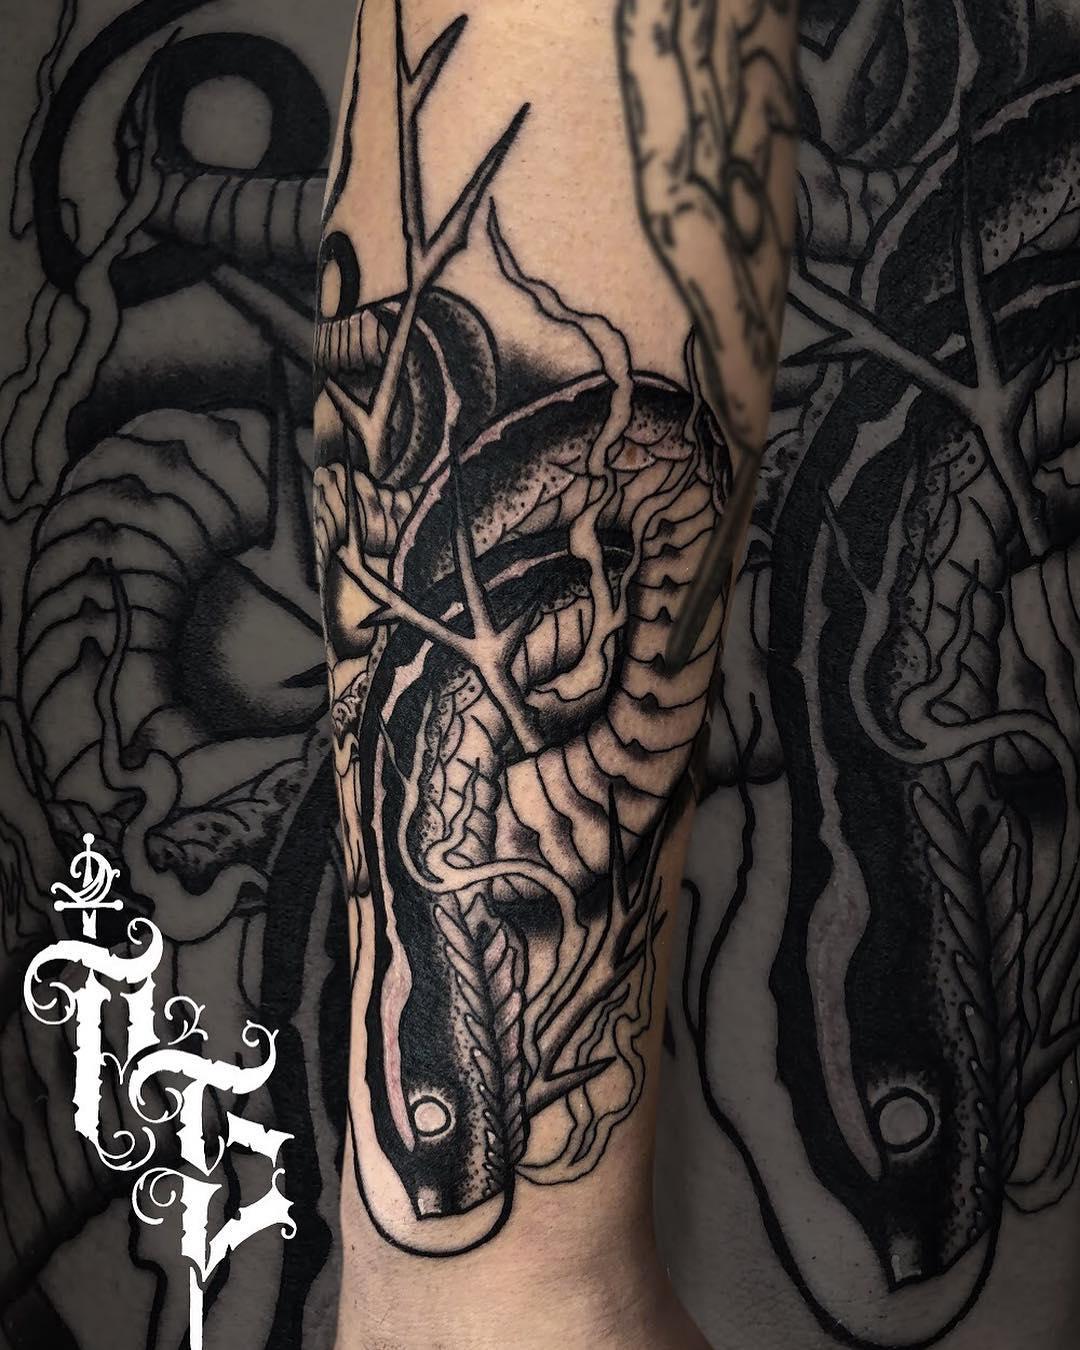 fca39cbc2a Stoneheads Tattoo   Body Piercing Wrocław - eTatuator.pl